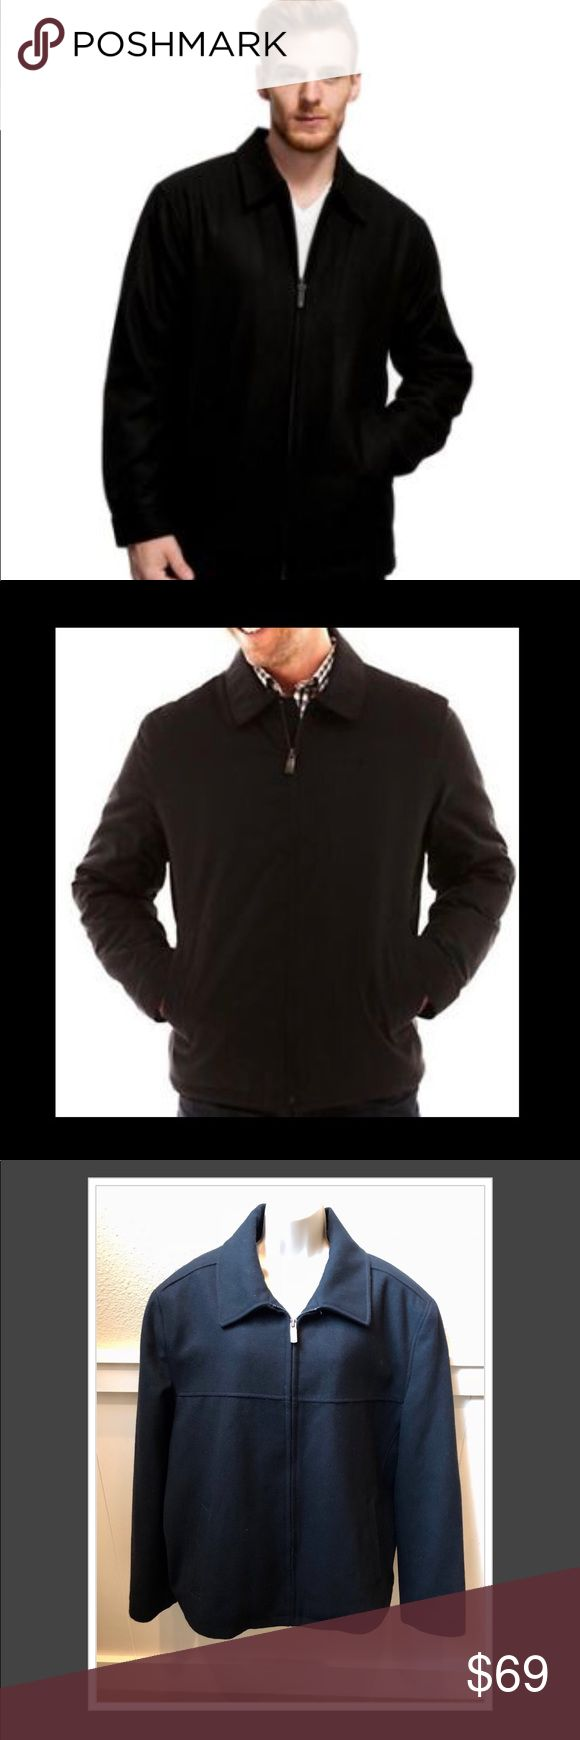 Never worn stylish Dockers men's black Pea Coat! Never worn stylish Dockers men's black wool & polyester full zip up lined Pea Coat! Sz XL Dockers Jackets & Coats Pea Coats